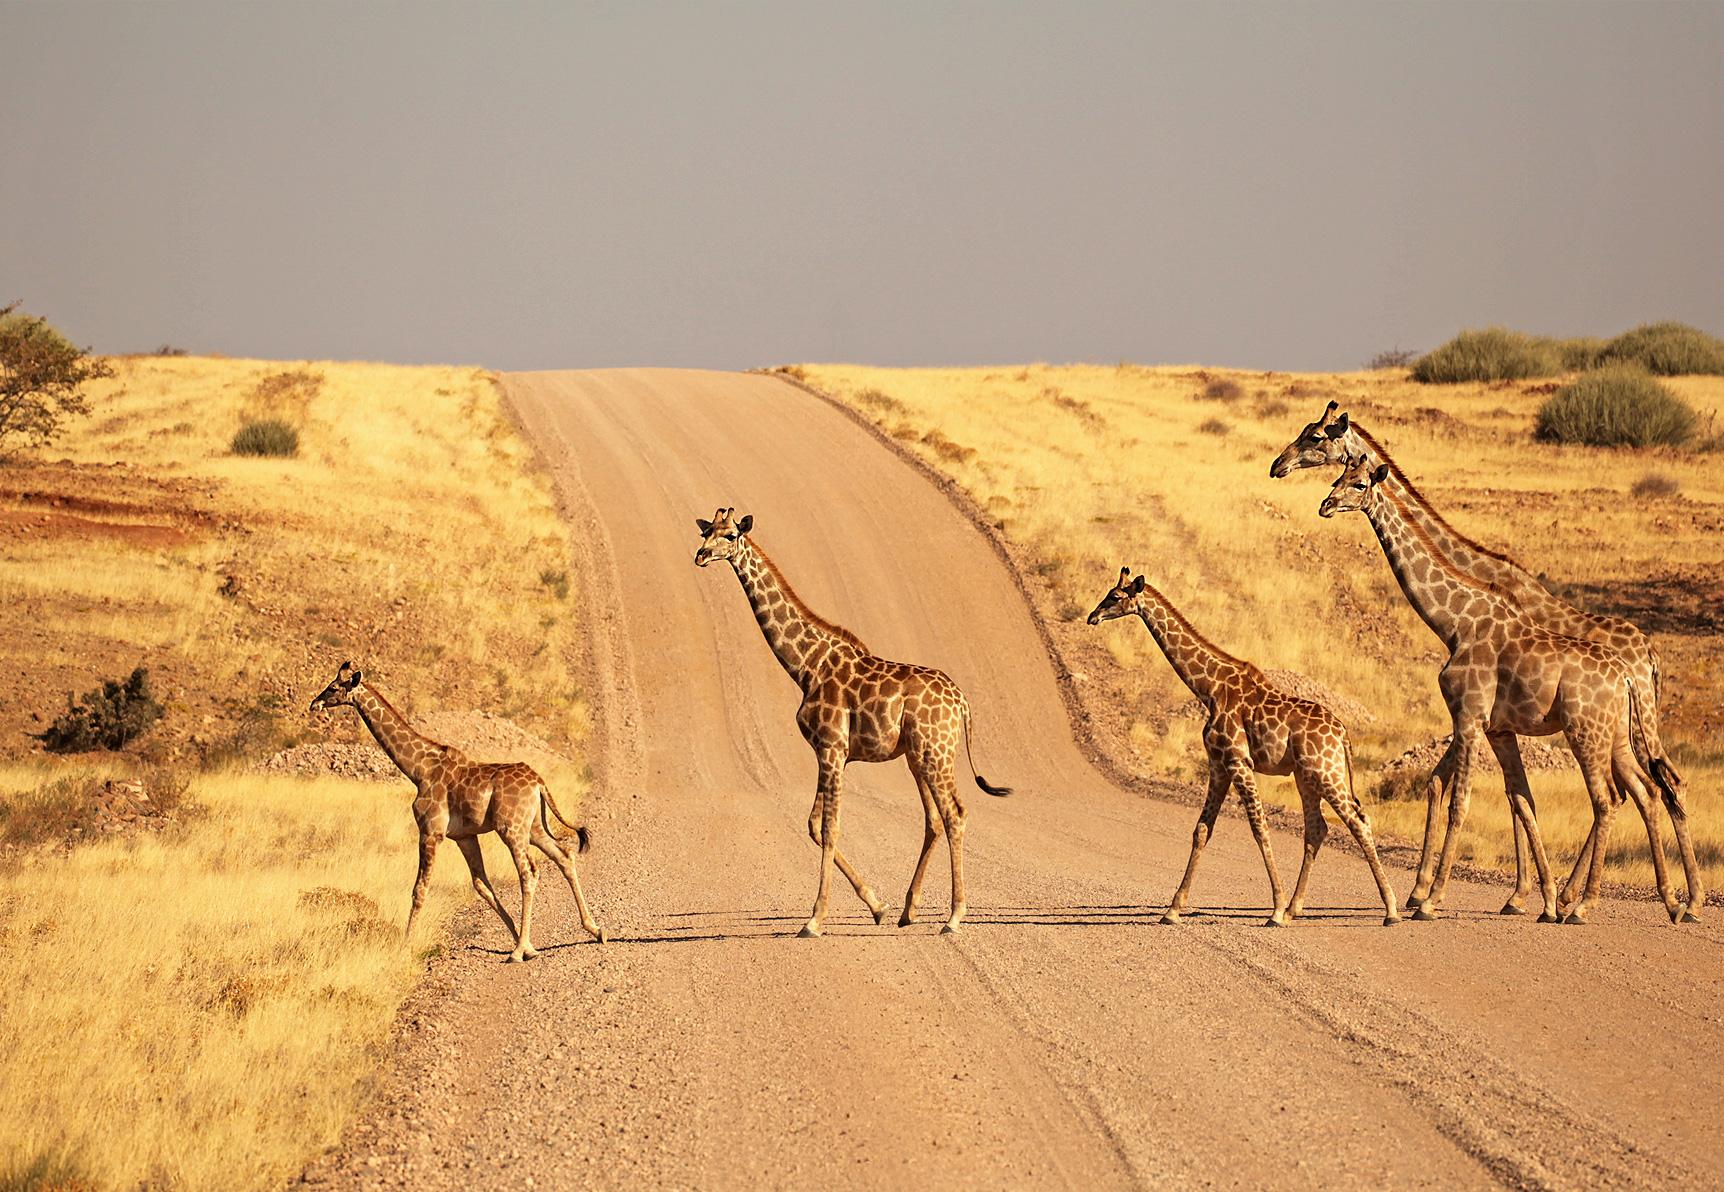 Self-drive Tours Namibia inline image 5bf2b36658916